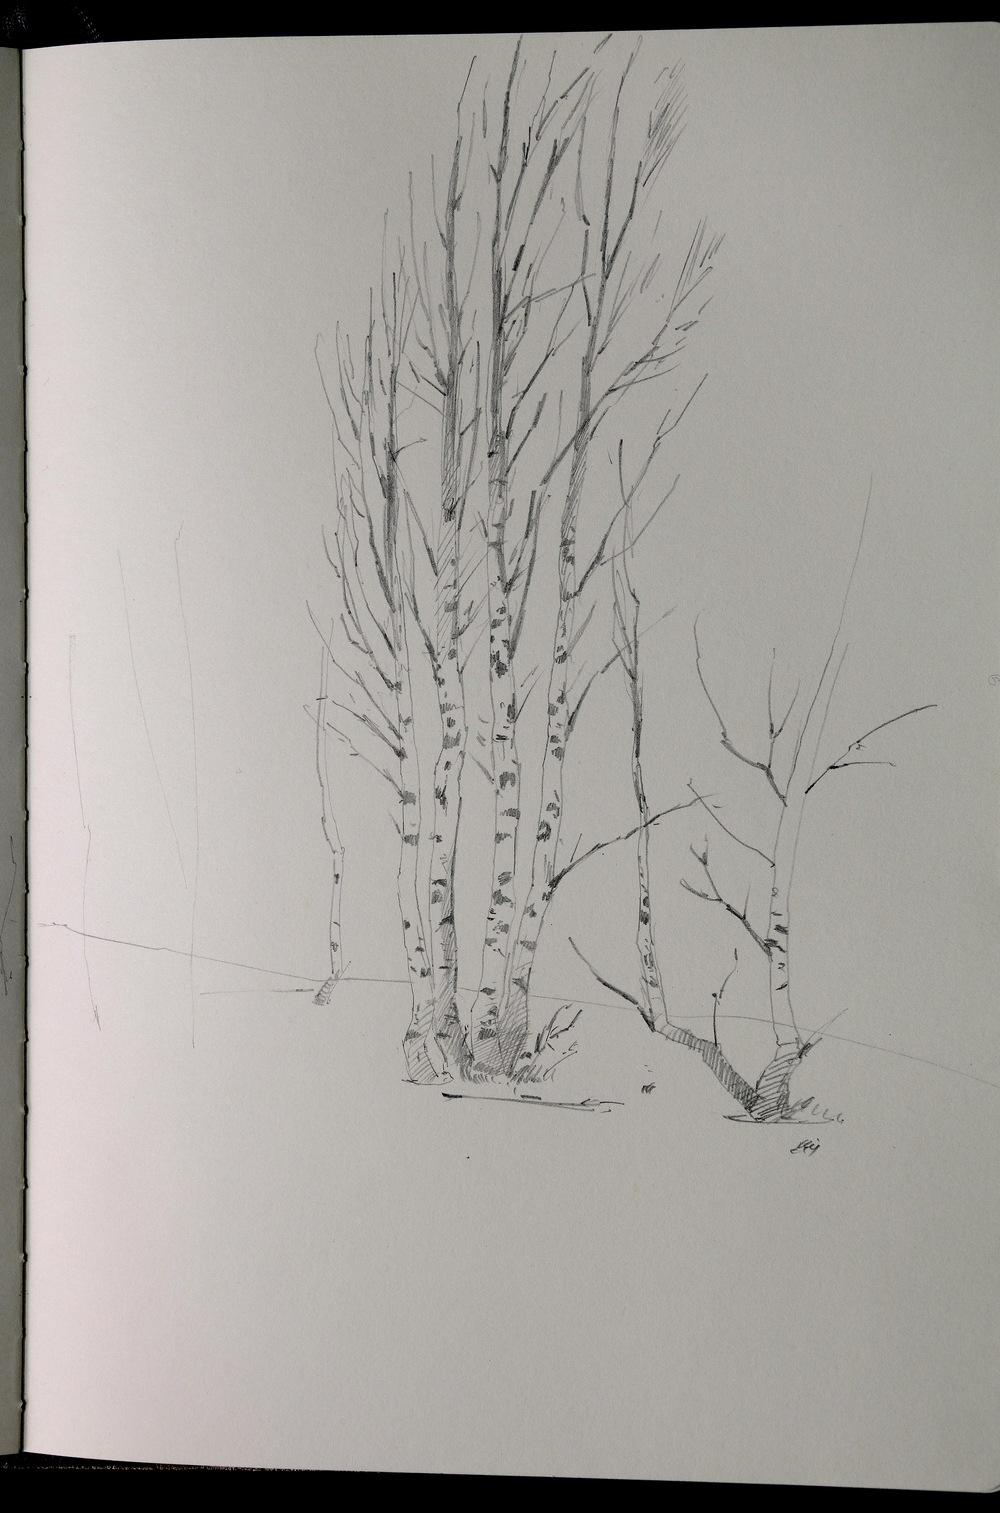 Birch trees in snow. Pencil, sketchbook.